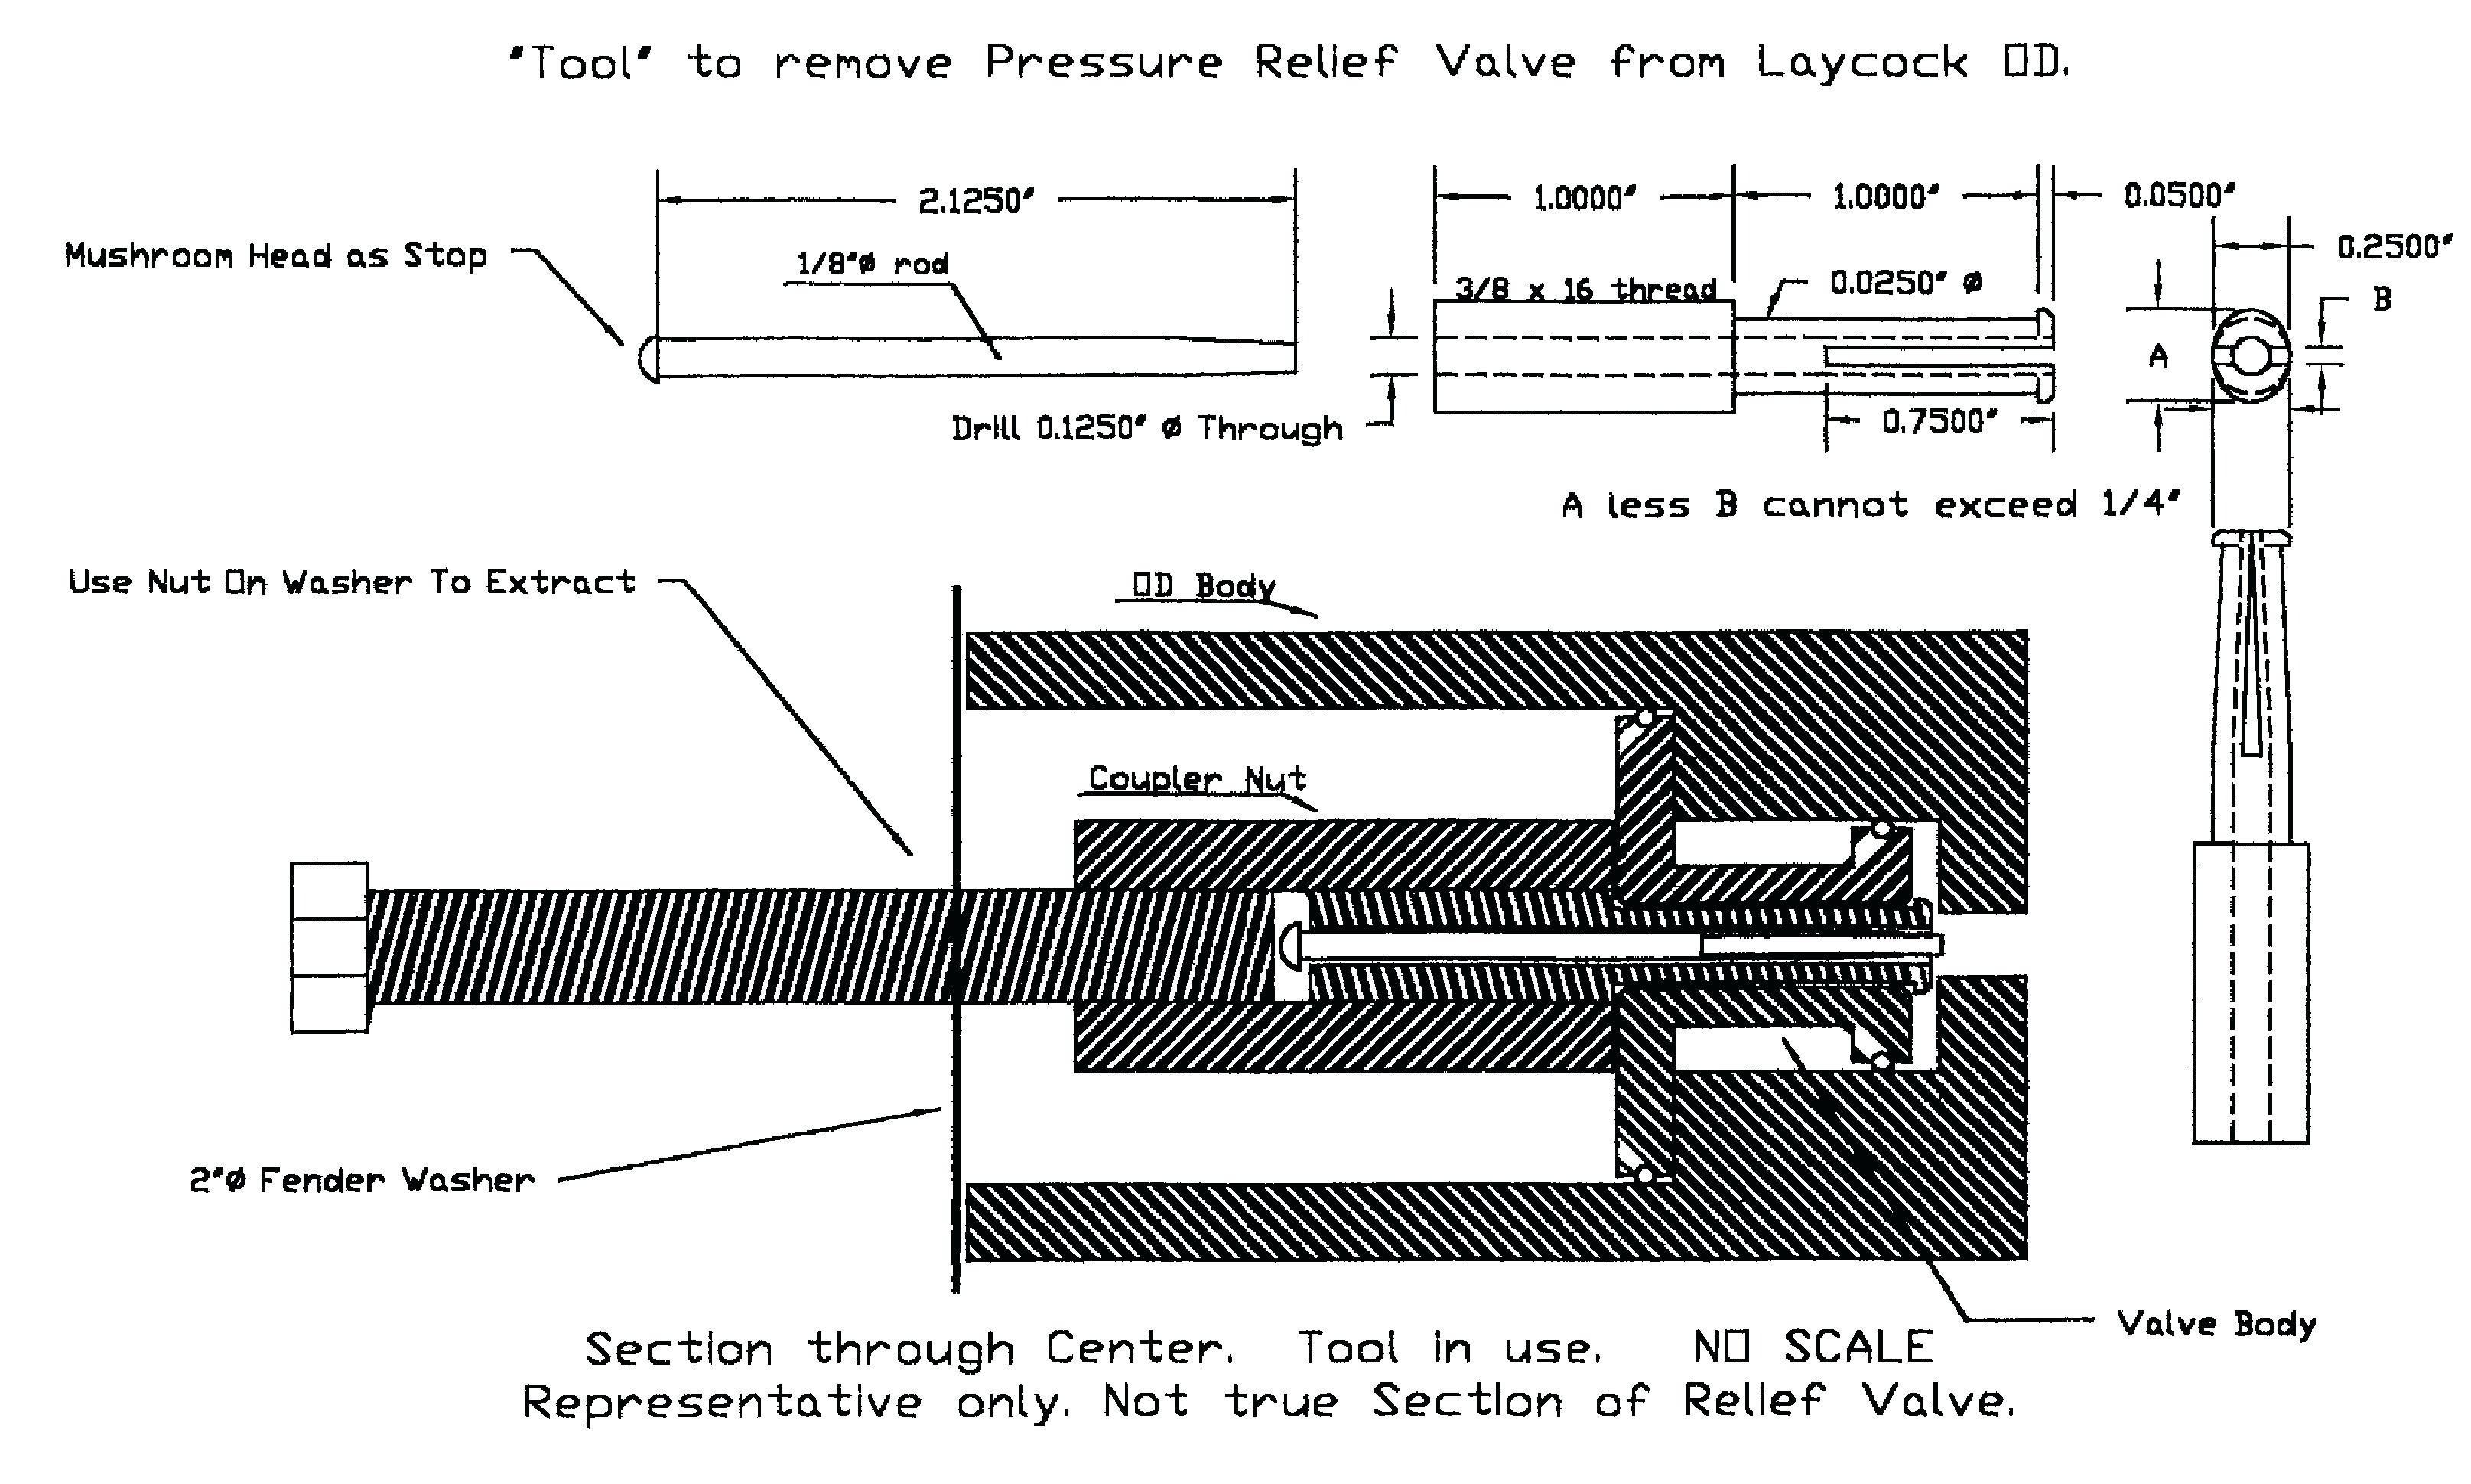 Whelen 295hfsa6 Wiring Diagram